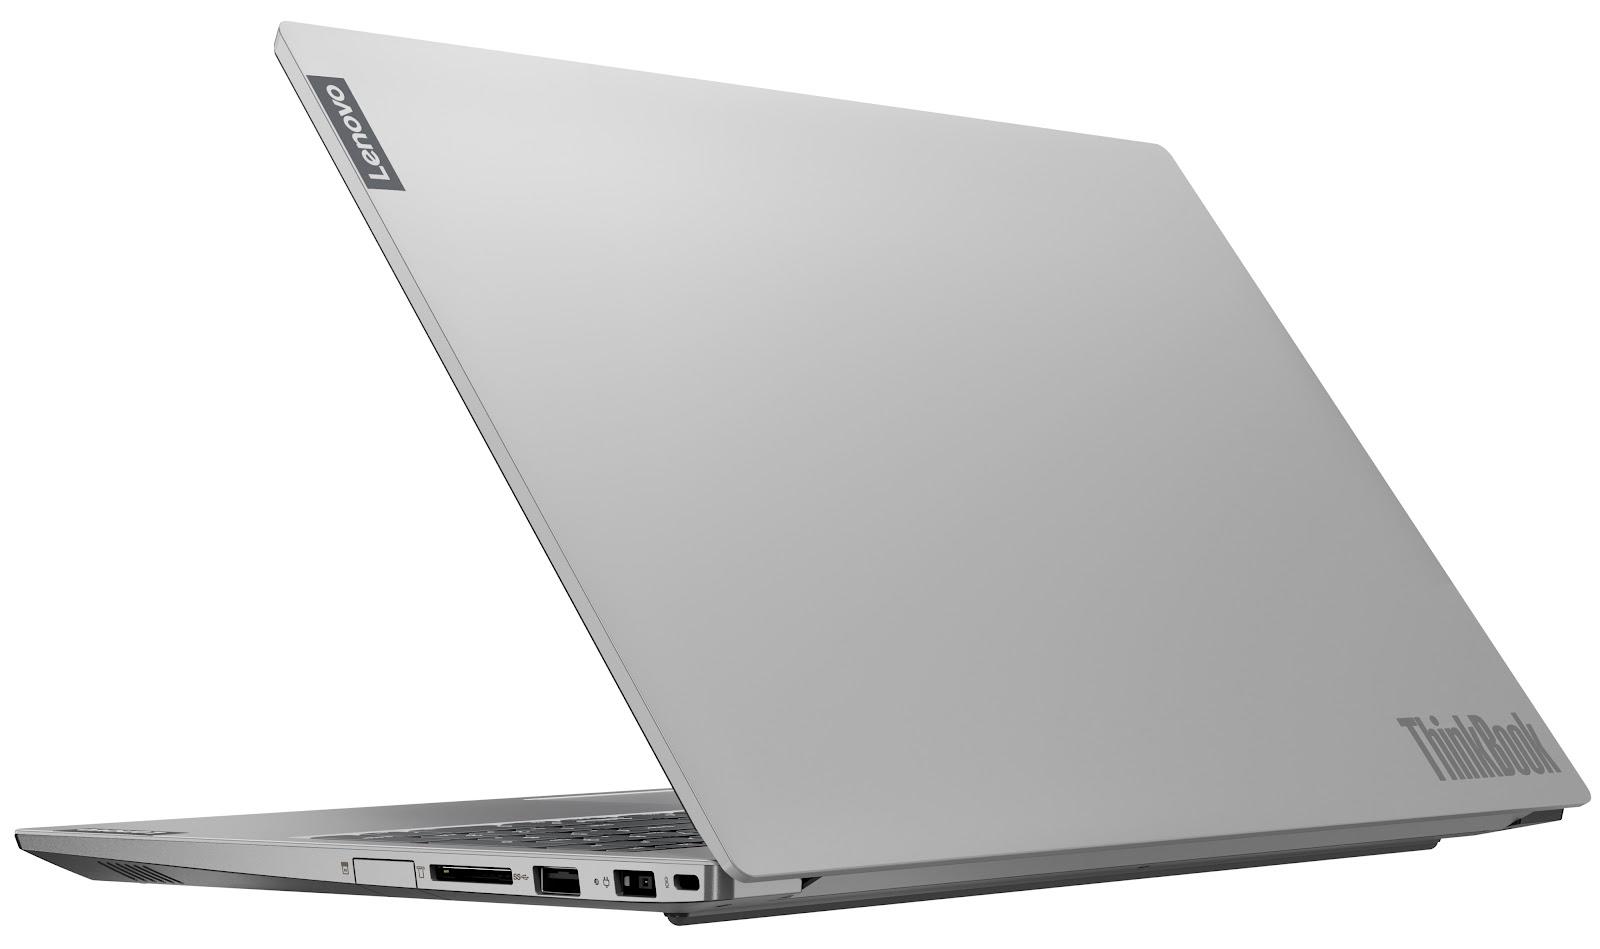 Фото 1. Ноутбук Lenovo ThinkBook 15-IIL (20SM003VRU)